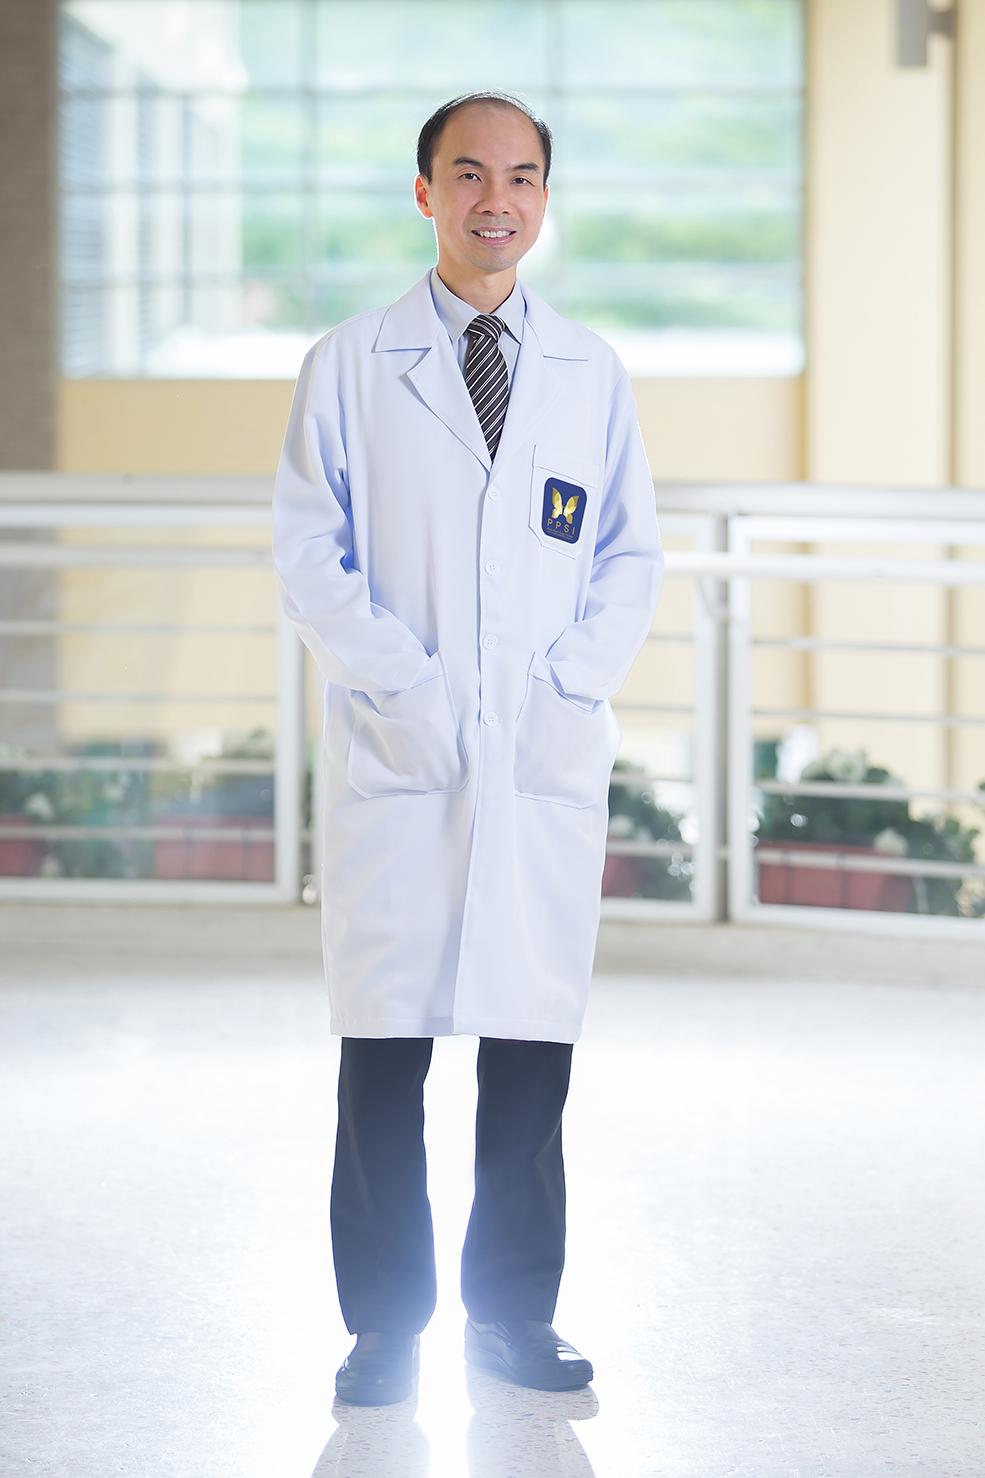 Dr. Poonsak Sumritmanoporn - General Practice, Plastic and Reconstructive Surgery